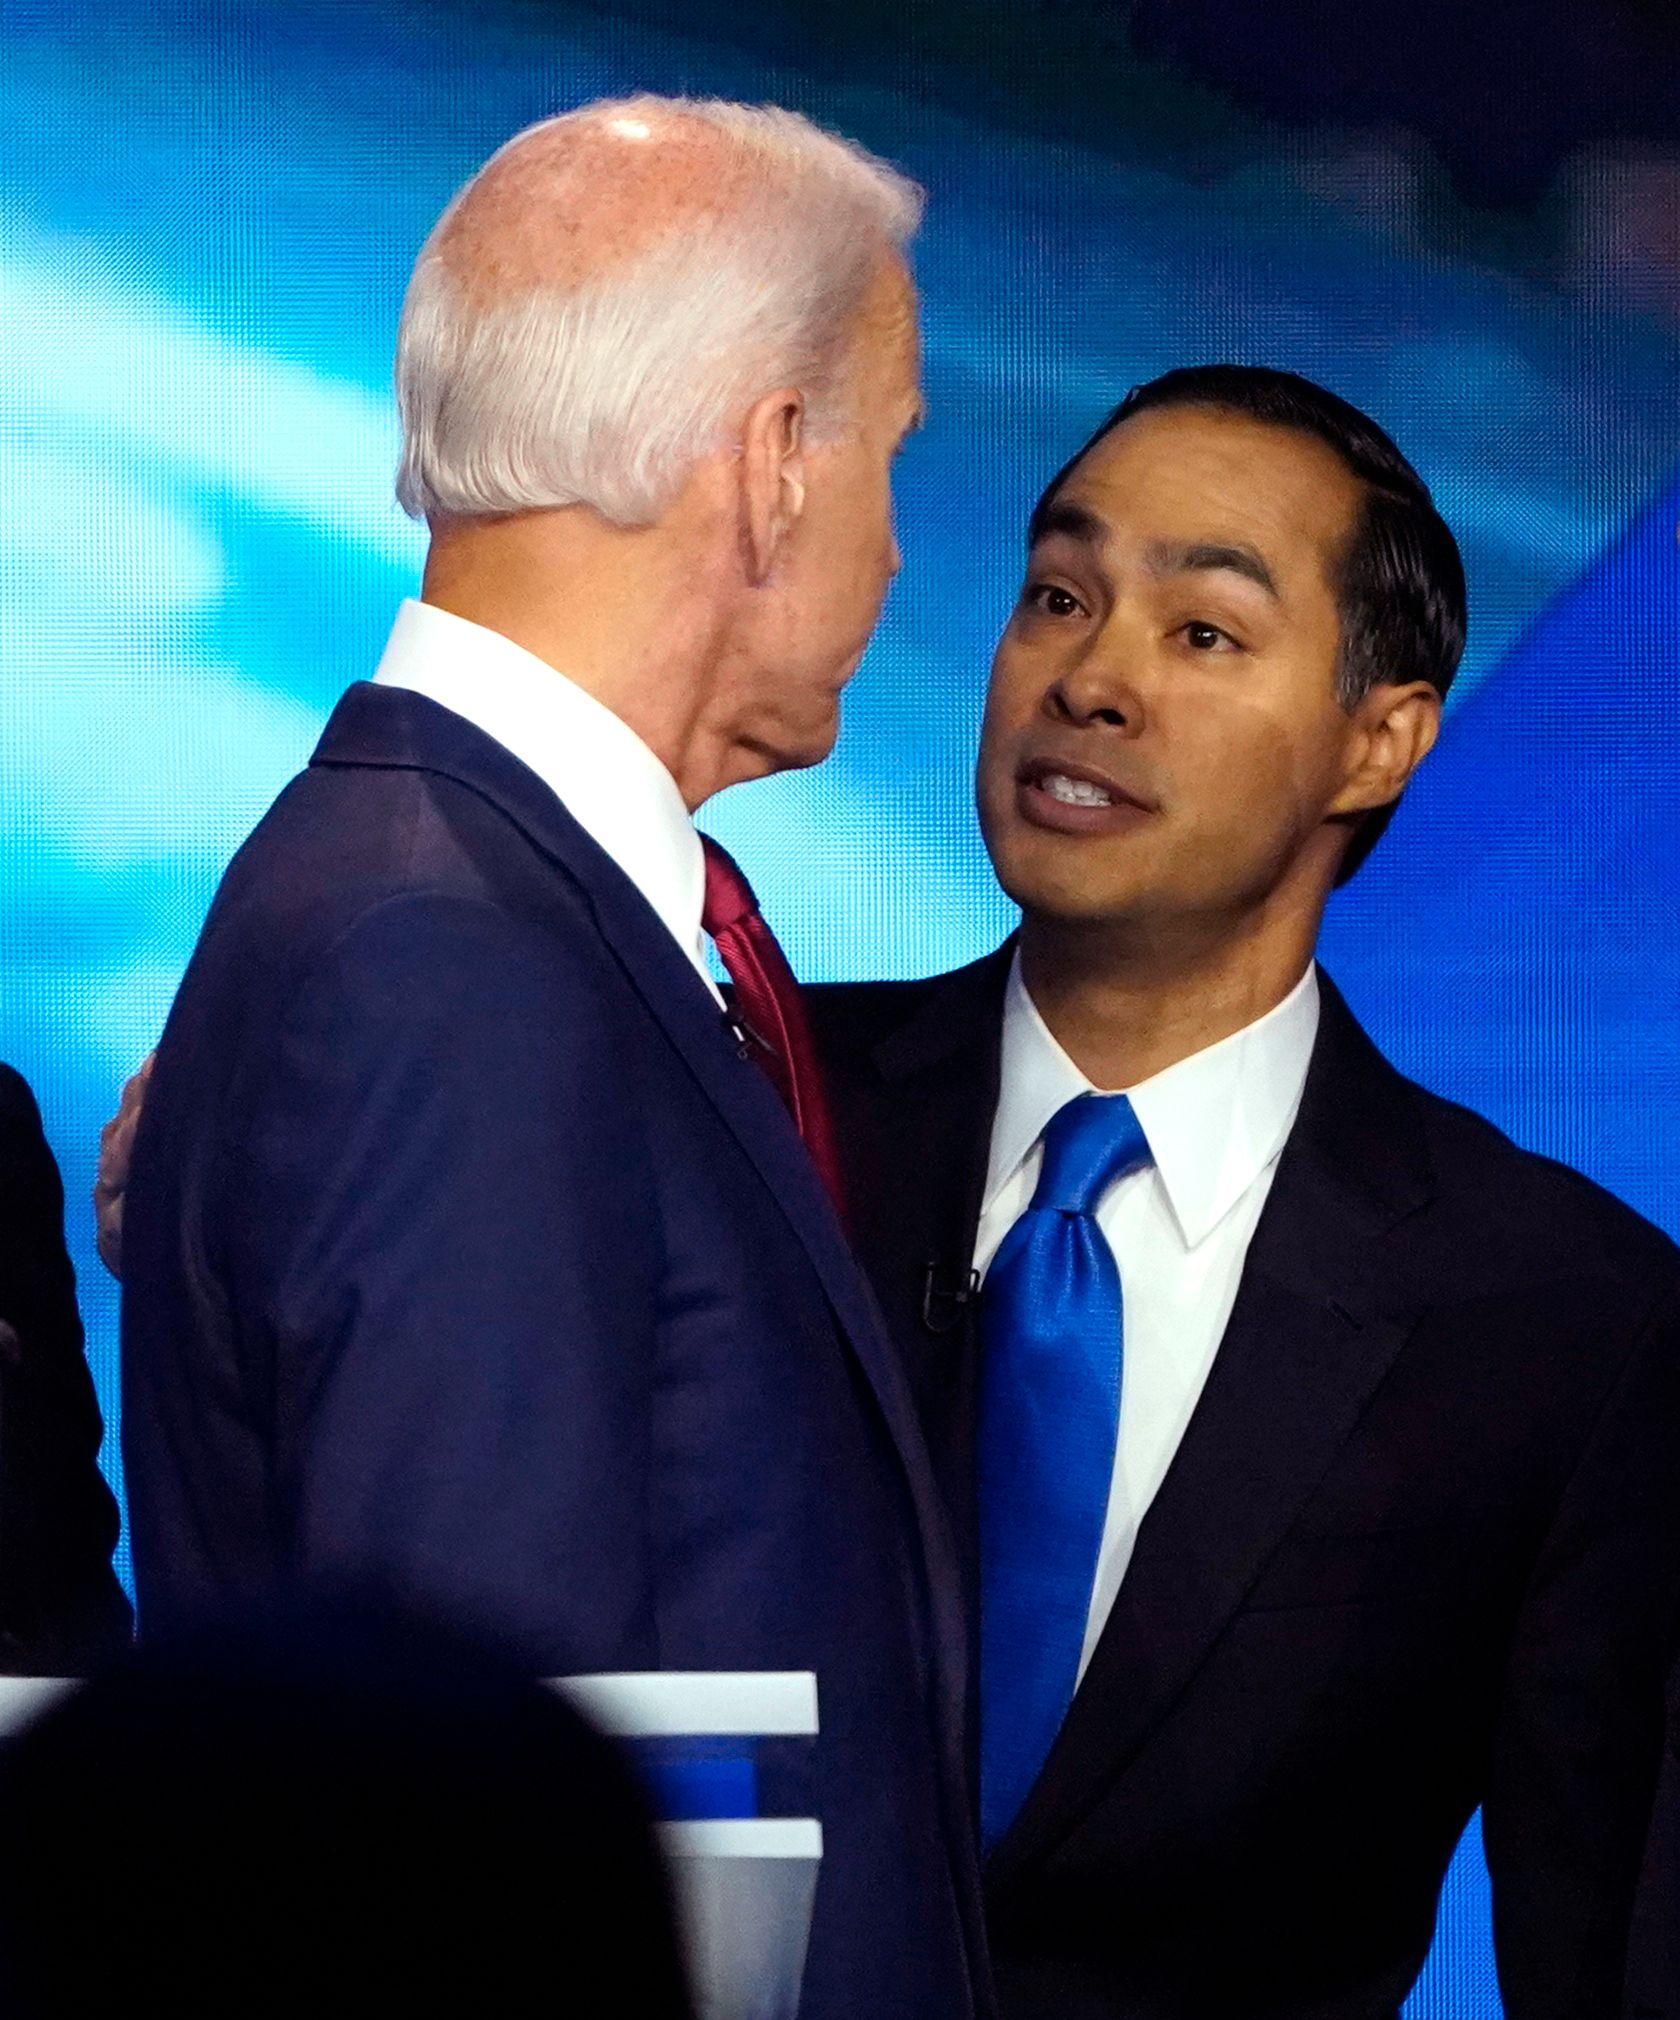 TETT I TETT: Joe Biden og Julián Castro fotografert sammen etter at debatten var over.